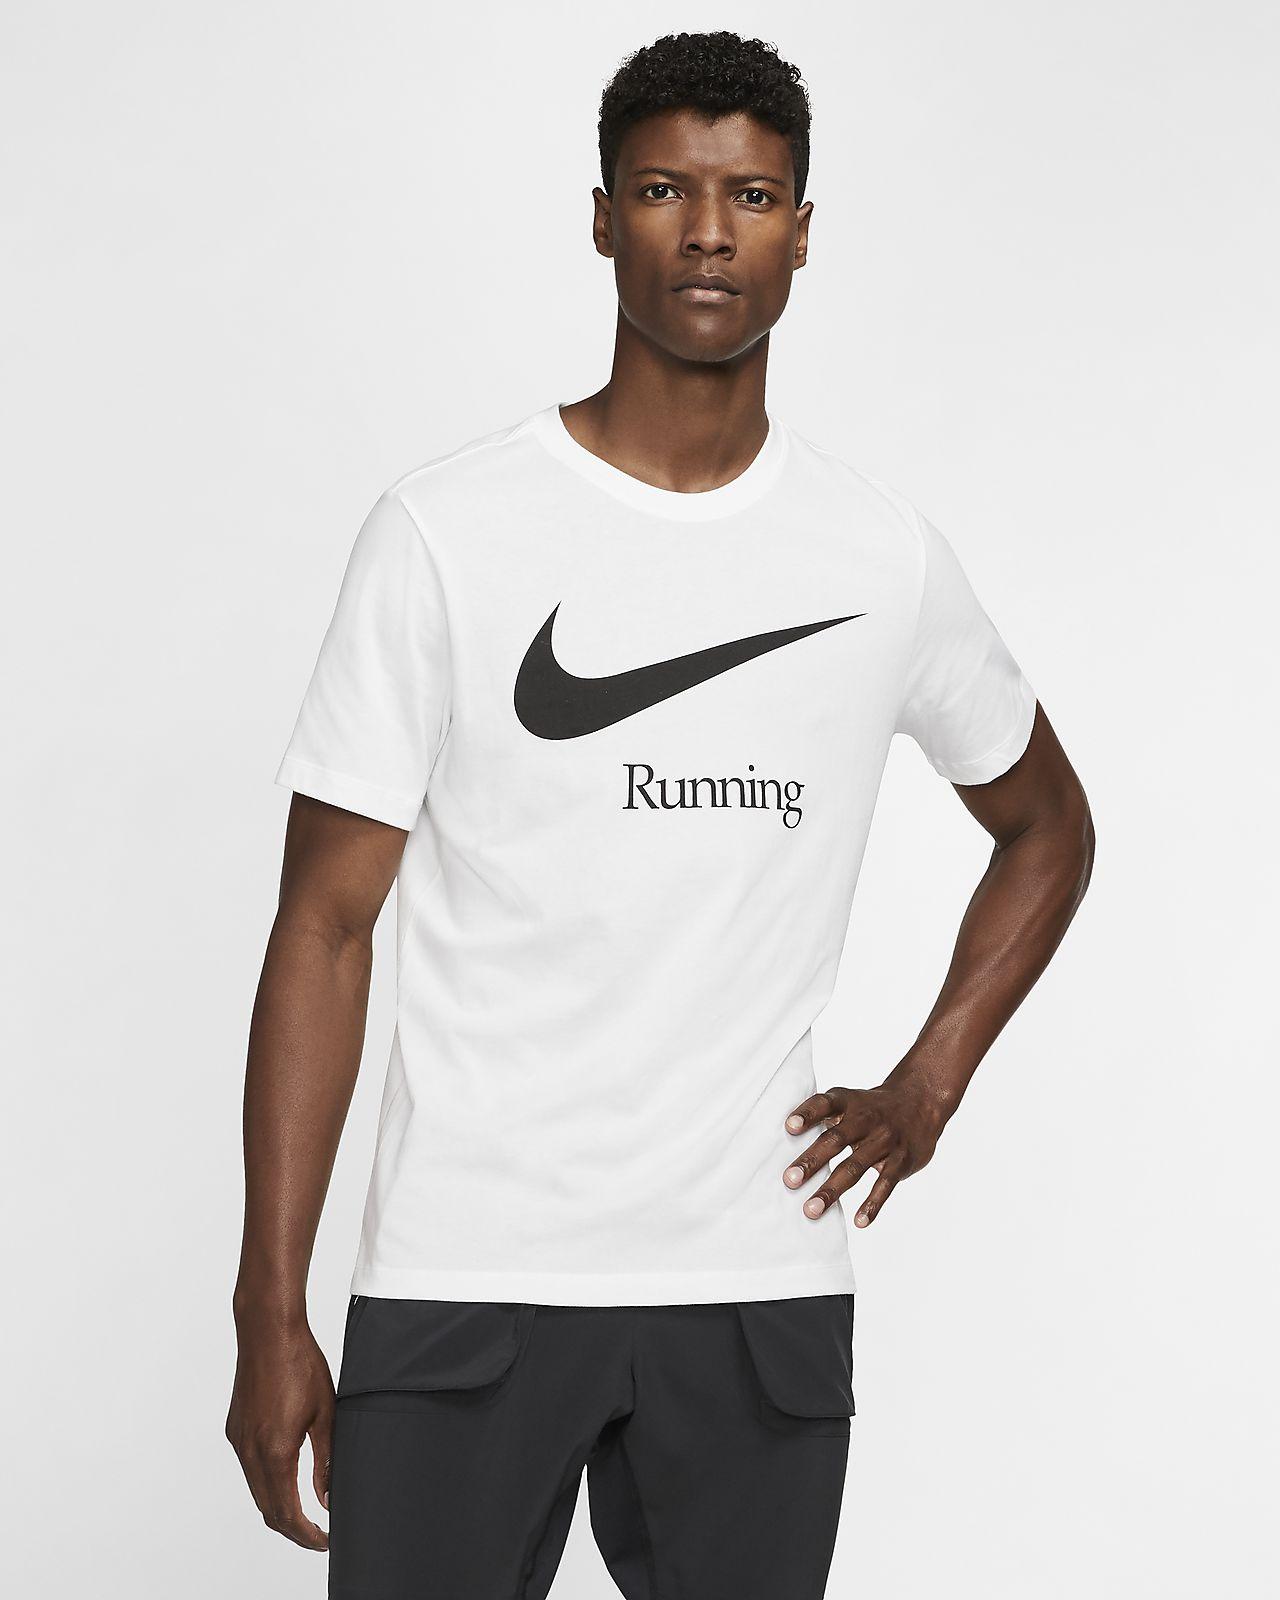 Nike Dri FIT Men's Running T Shirt